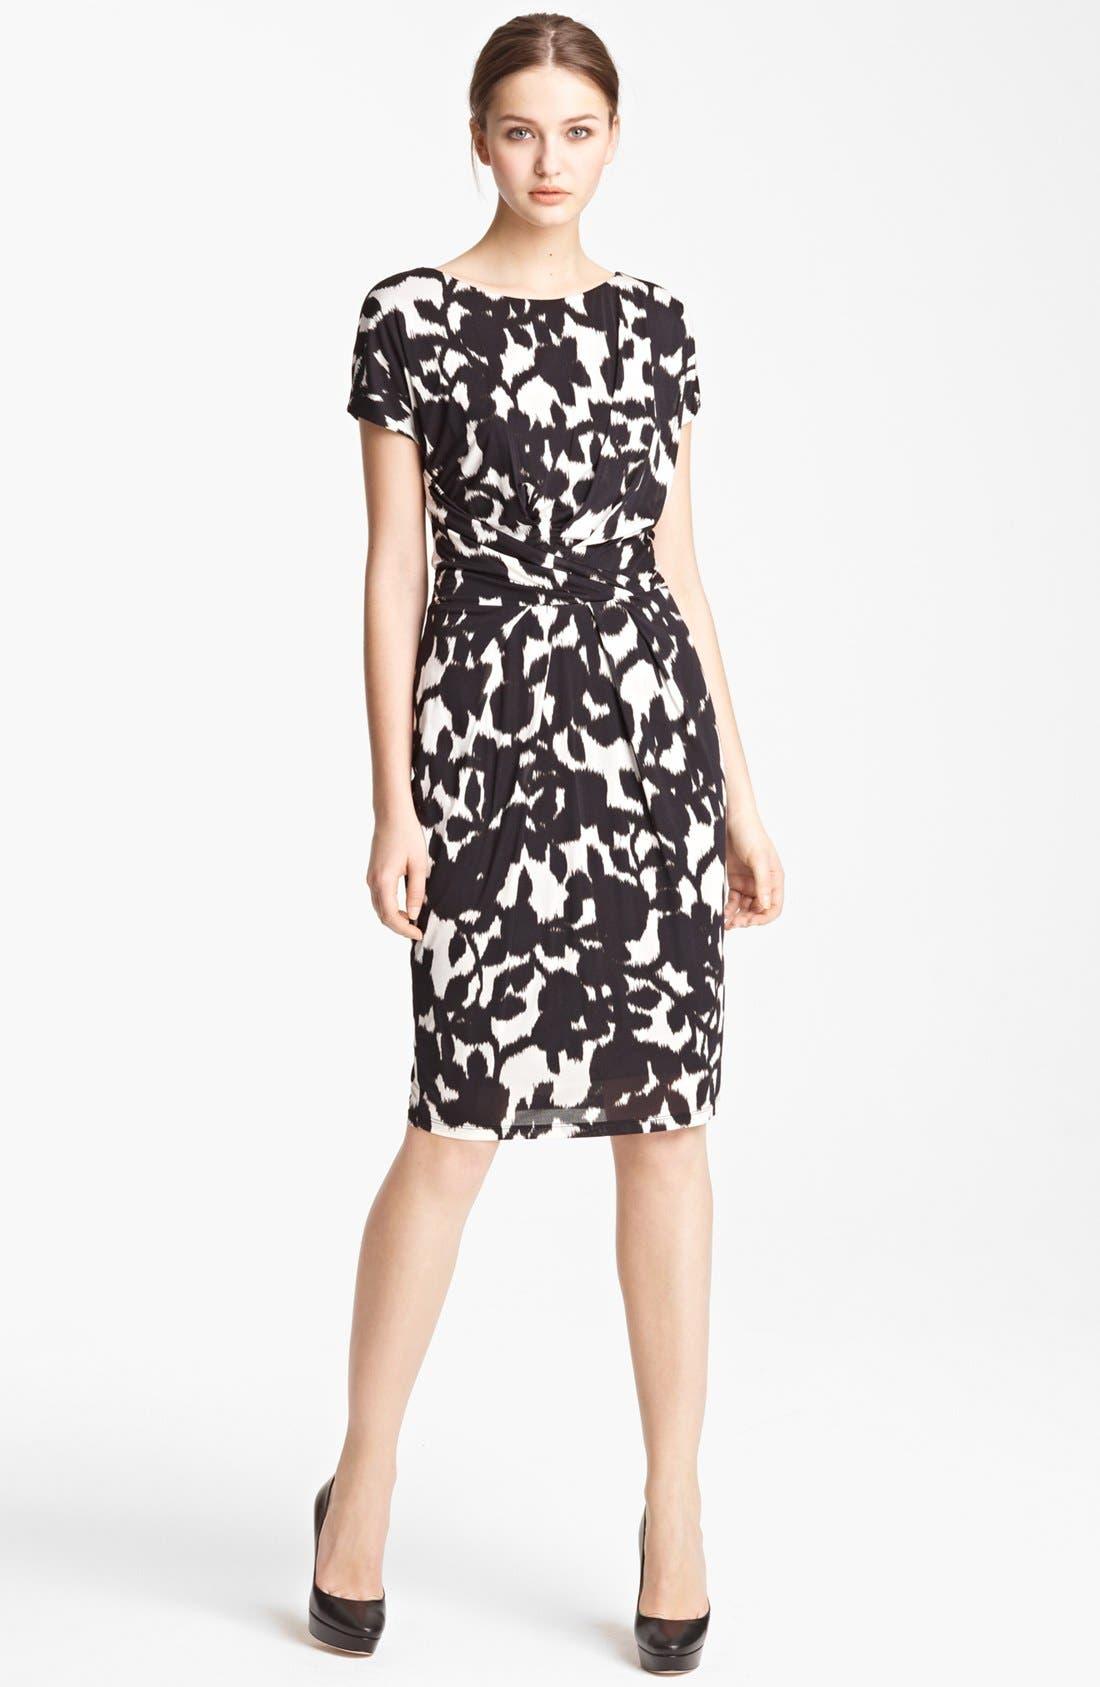 Main Image - Max Mara 'Canore' Print Jersey Dress